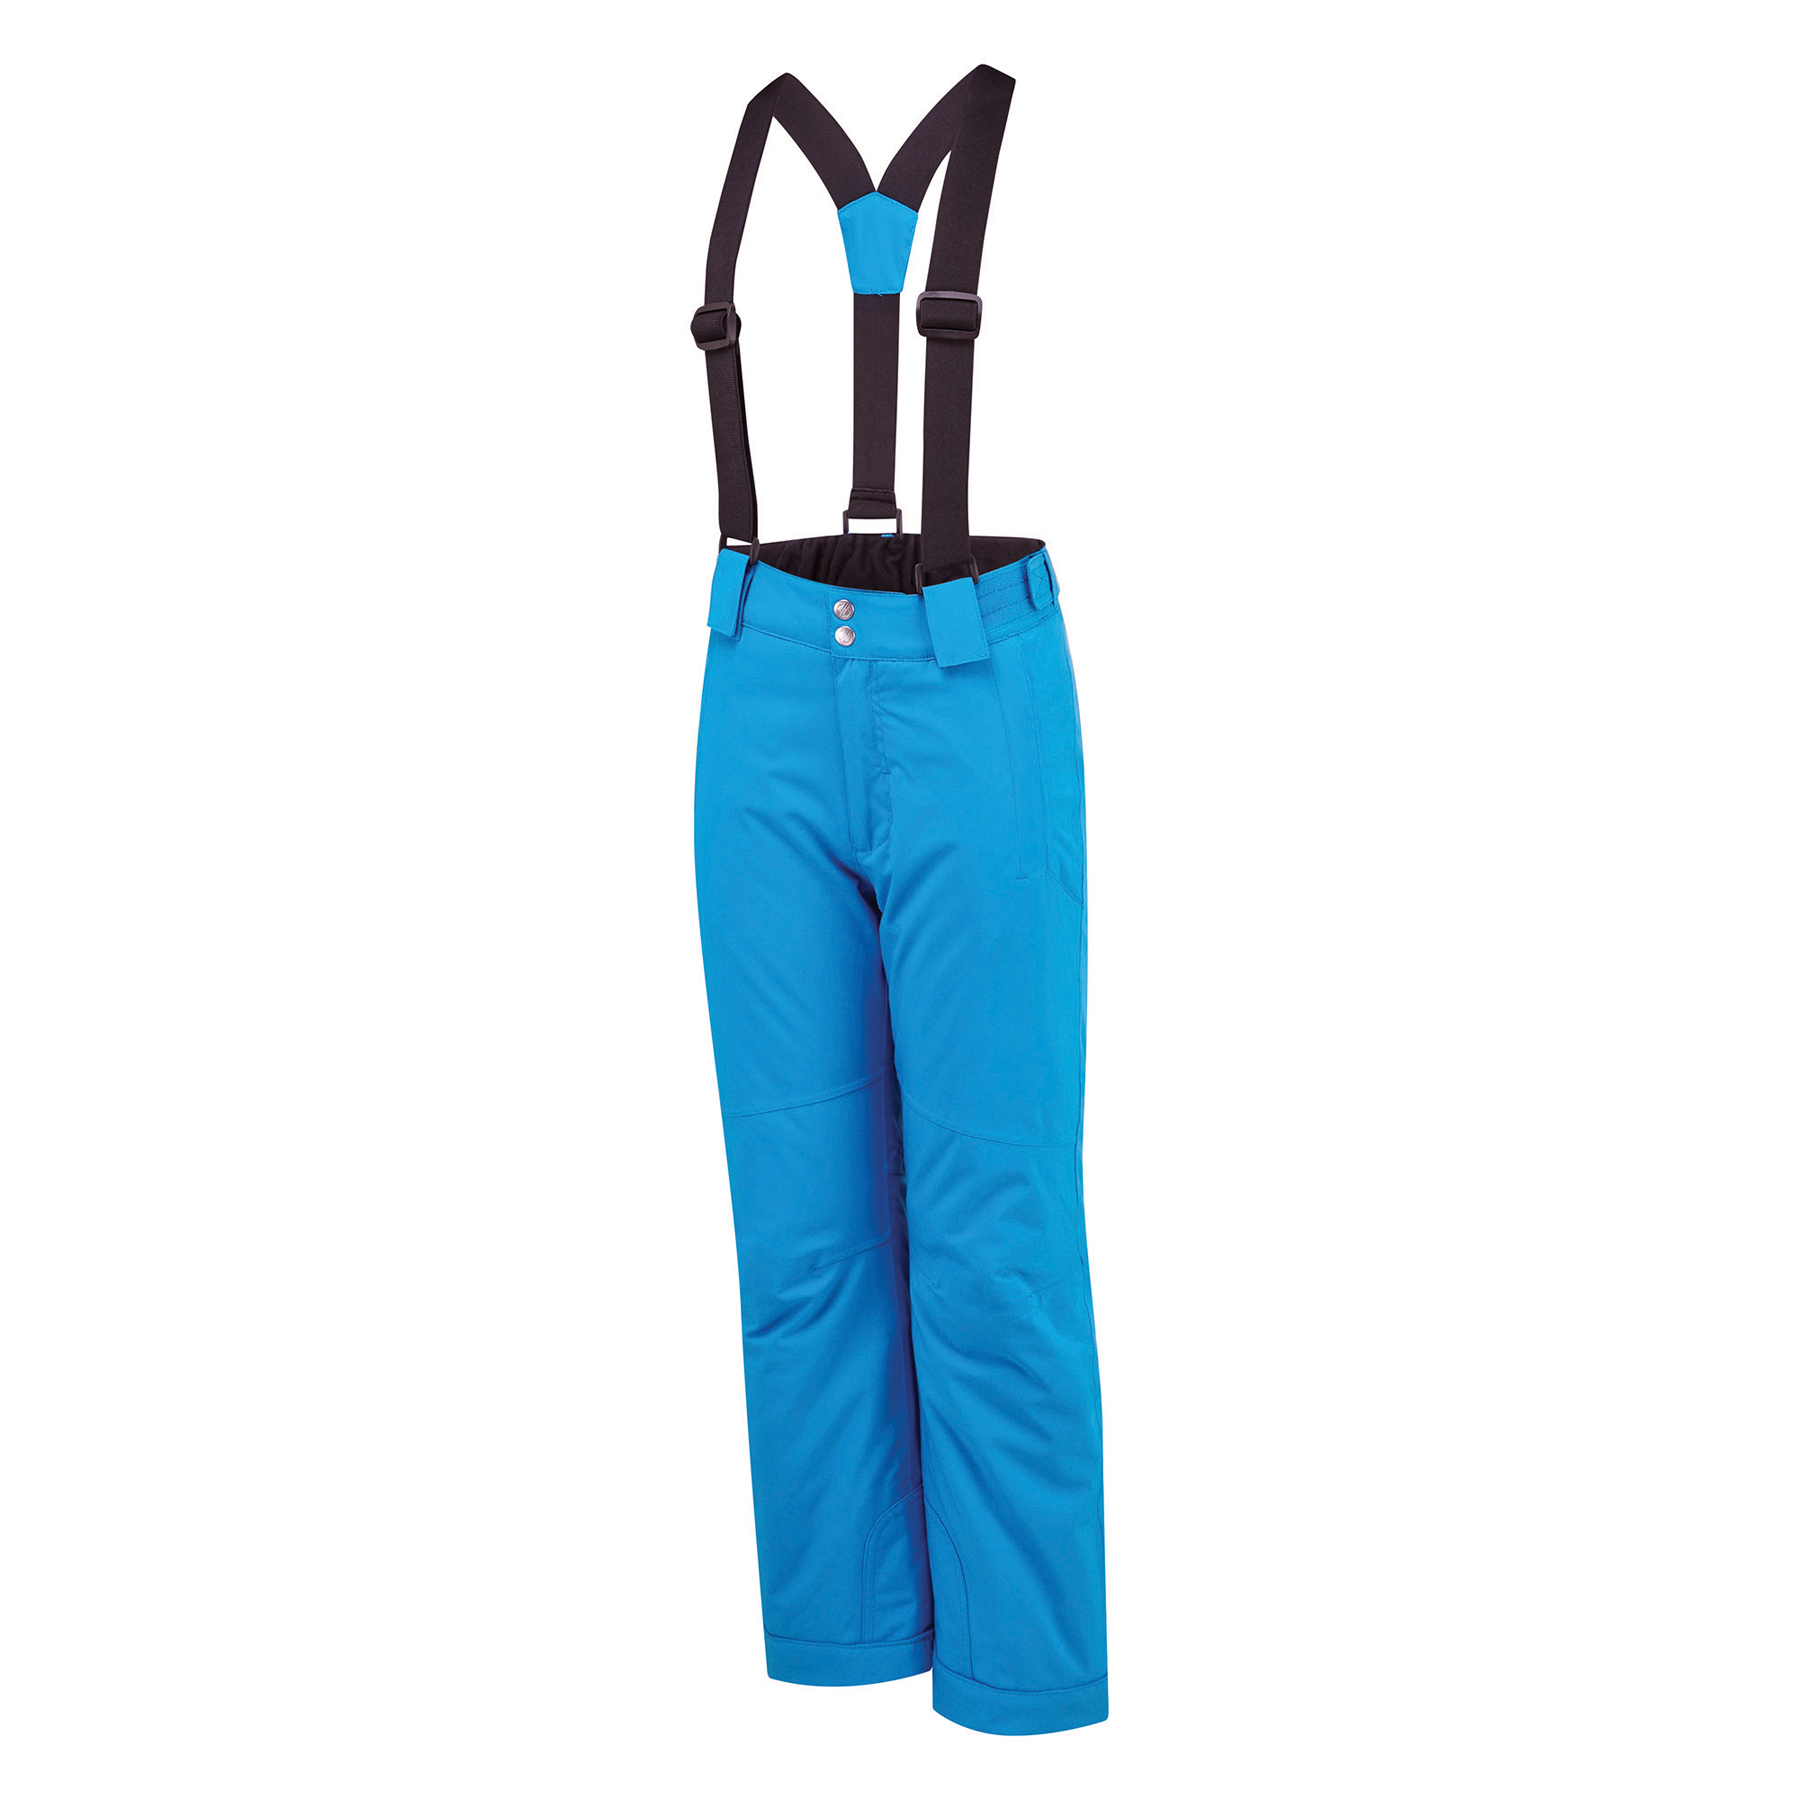 Dare 2b Outmove II Pants Kids - 5NN Methyl Blue